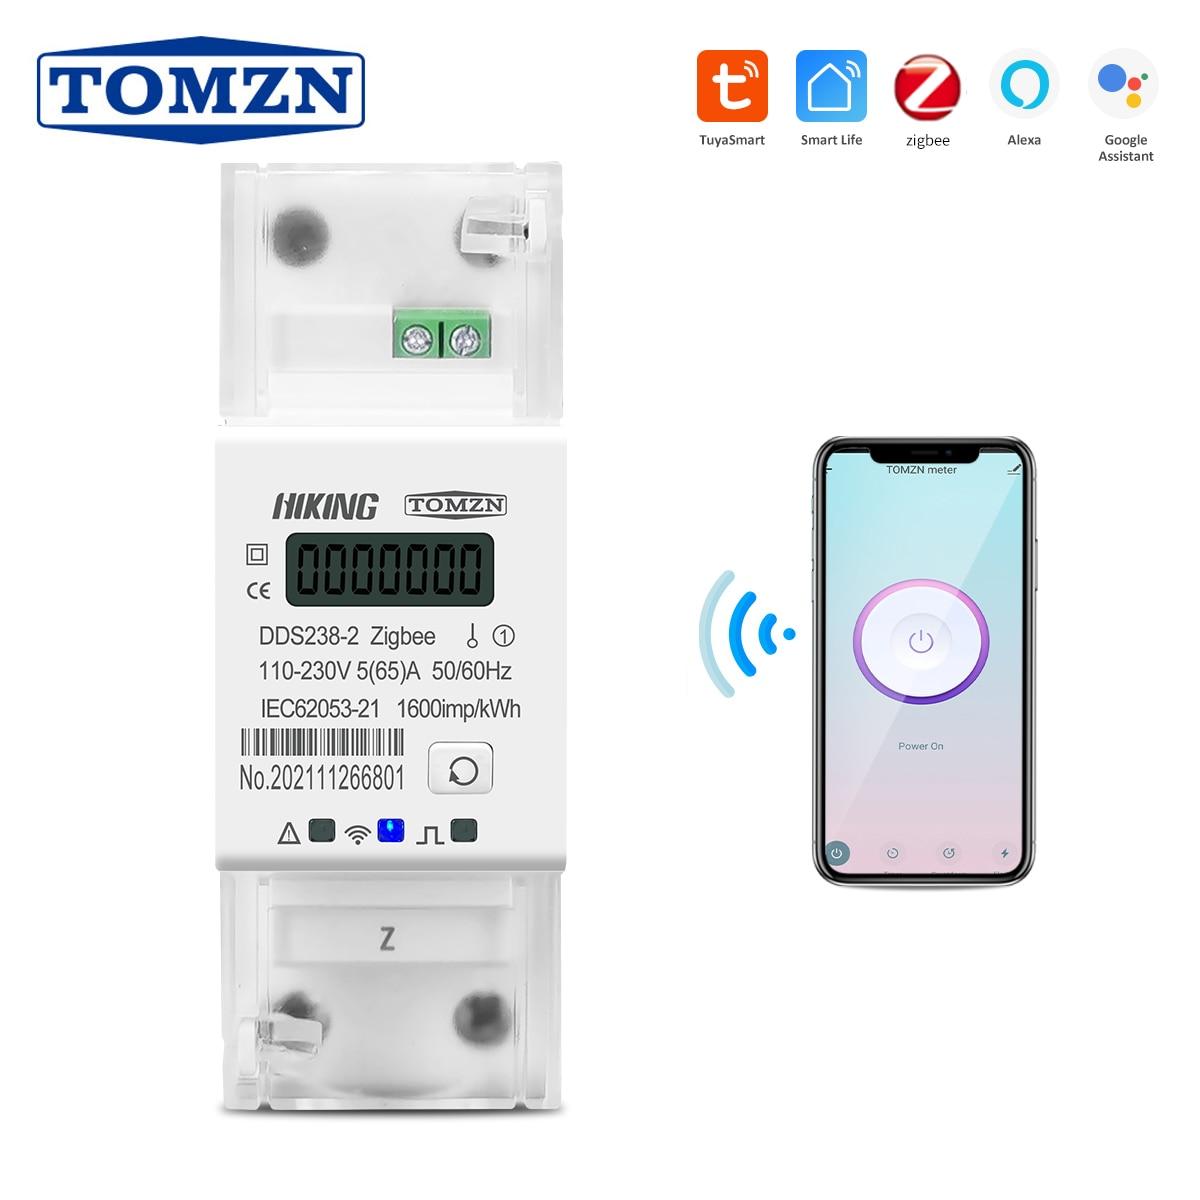 Zigbee Tuya Single Phase 65A Din Rail WIFI Smart Energy Meter timer Monitor kWh Meter Wattmeter 110V 220V 50/60Hz